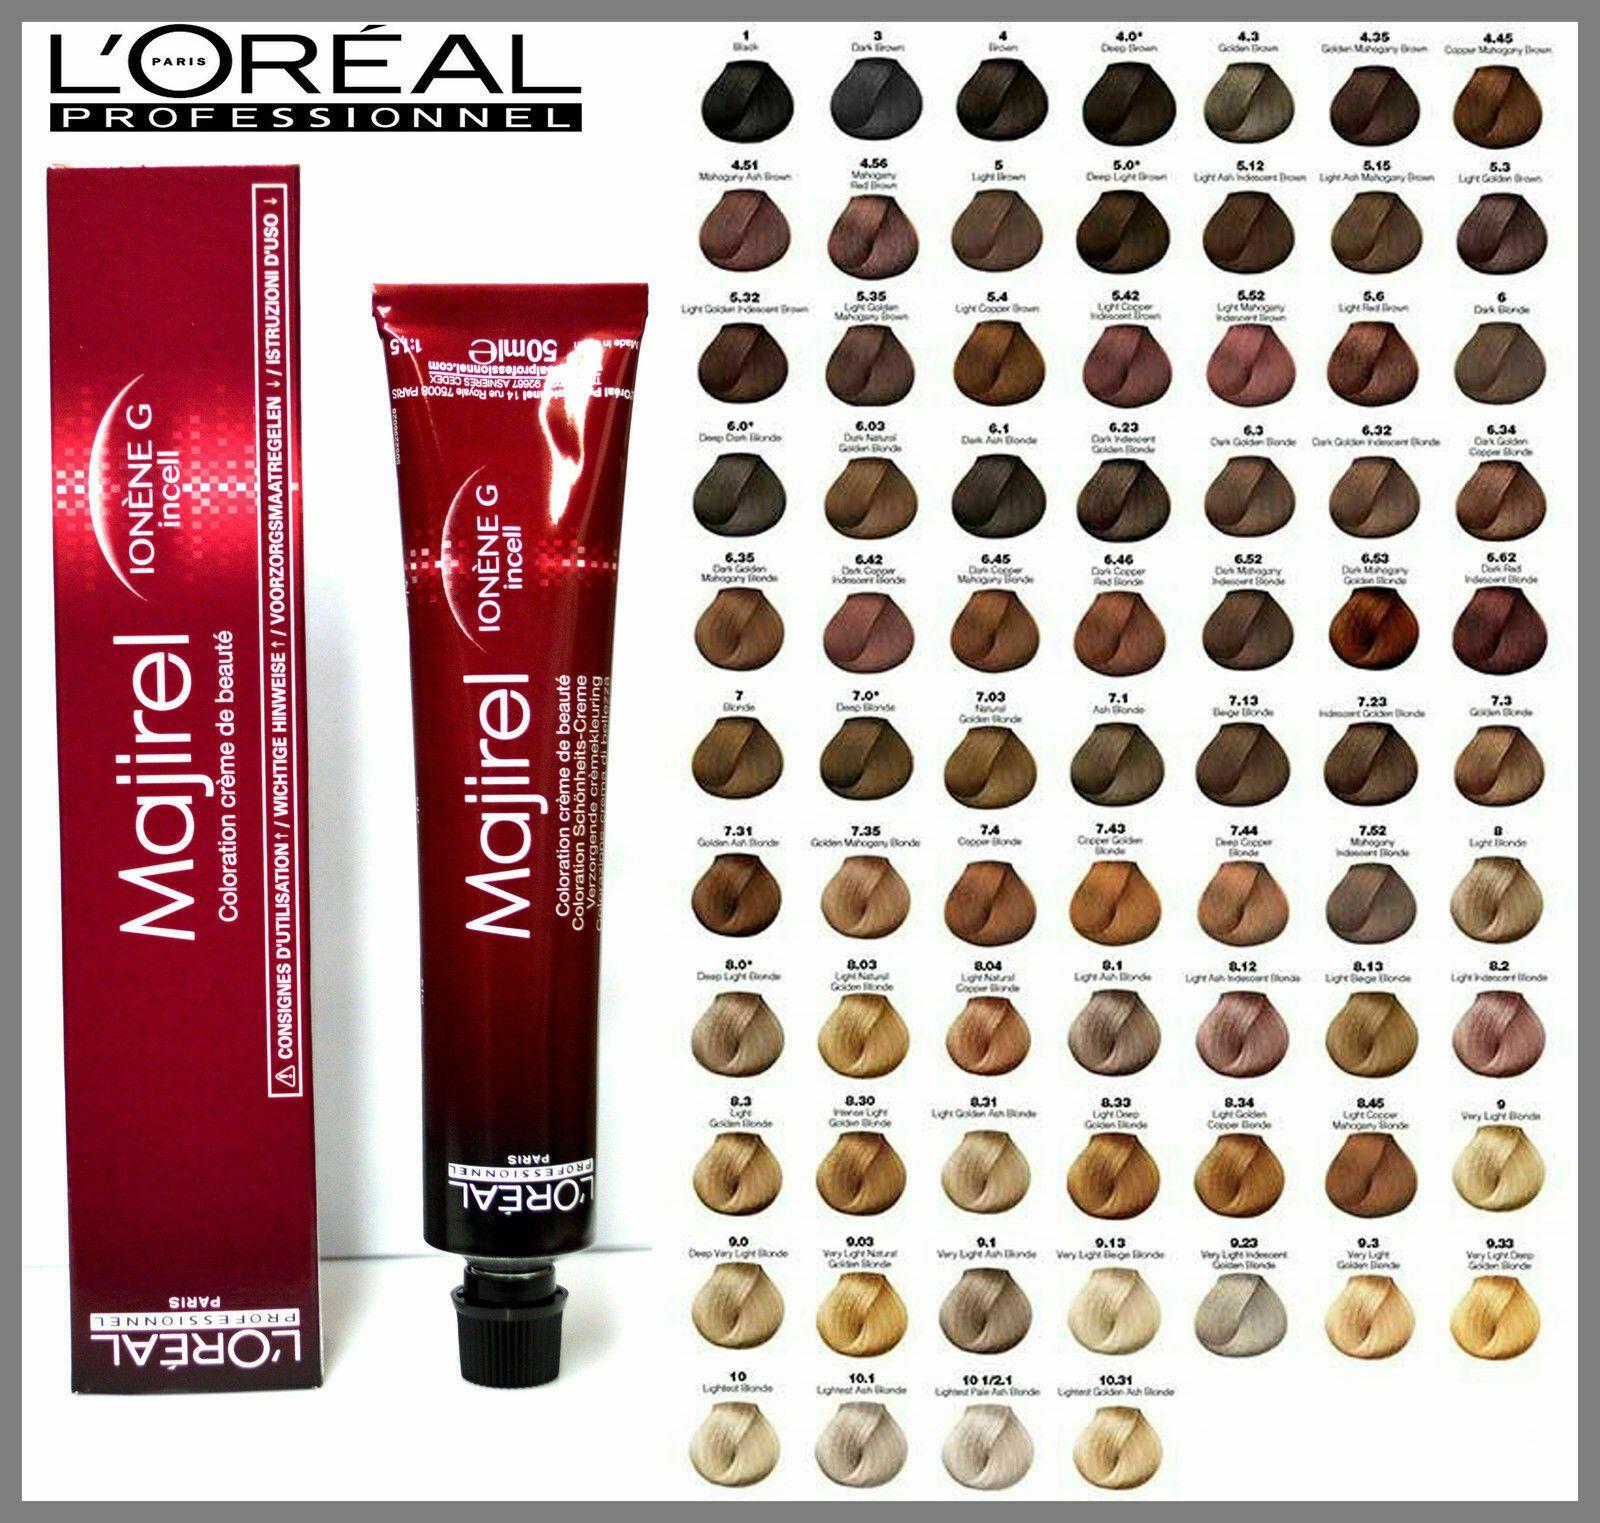 Loreal Professional Majirel Majirouge Blonde Hair Dye Colour 50ml Tube Ebay Em 2020 Tinta De Cabelo Coloracao De Cabelo Cabelo